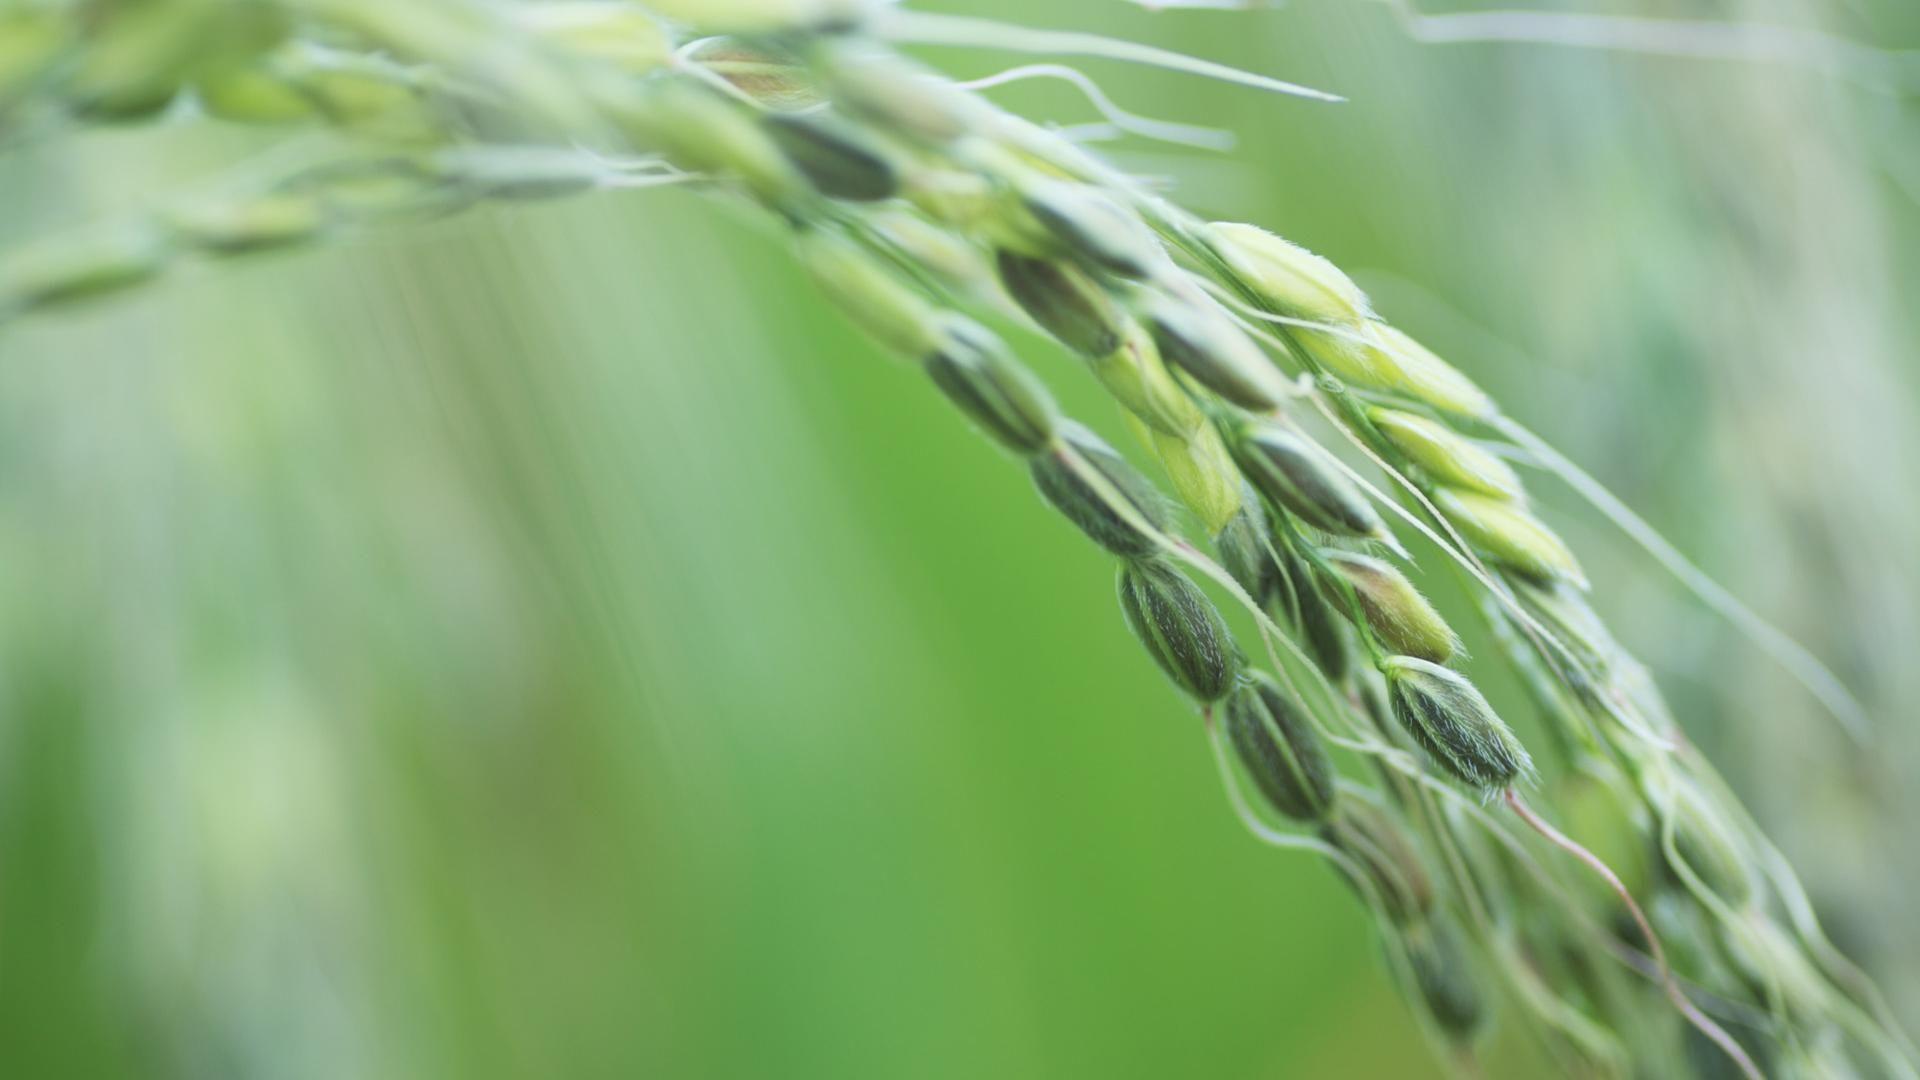 Rice 1080p picture